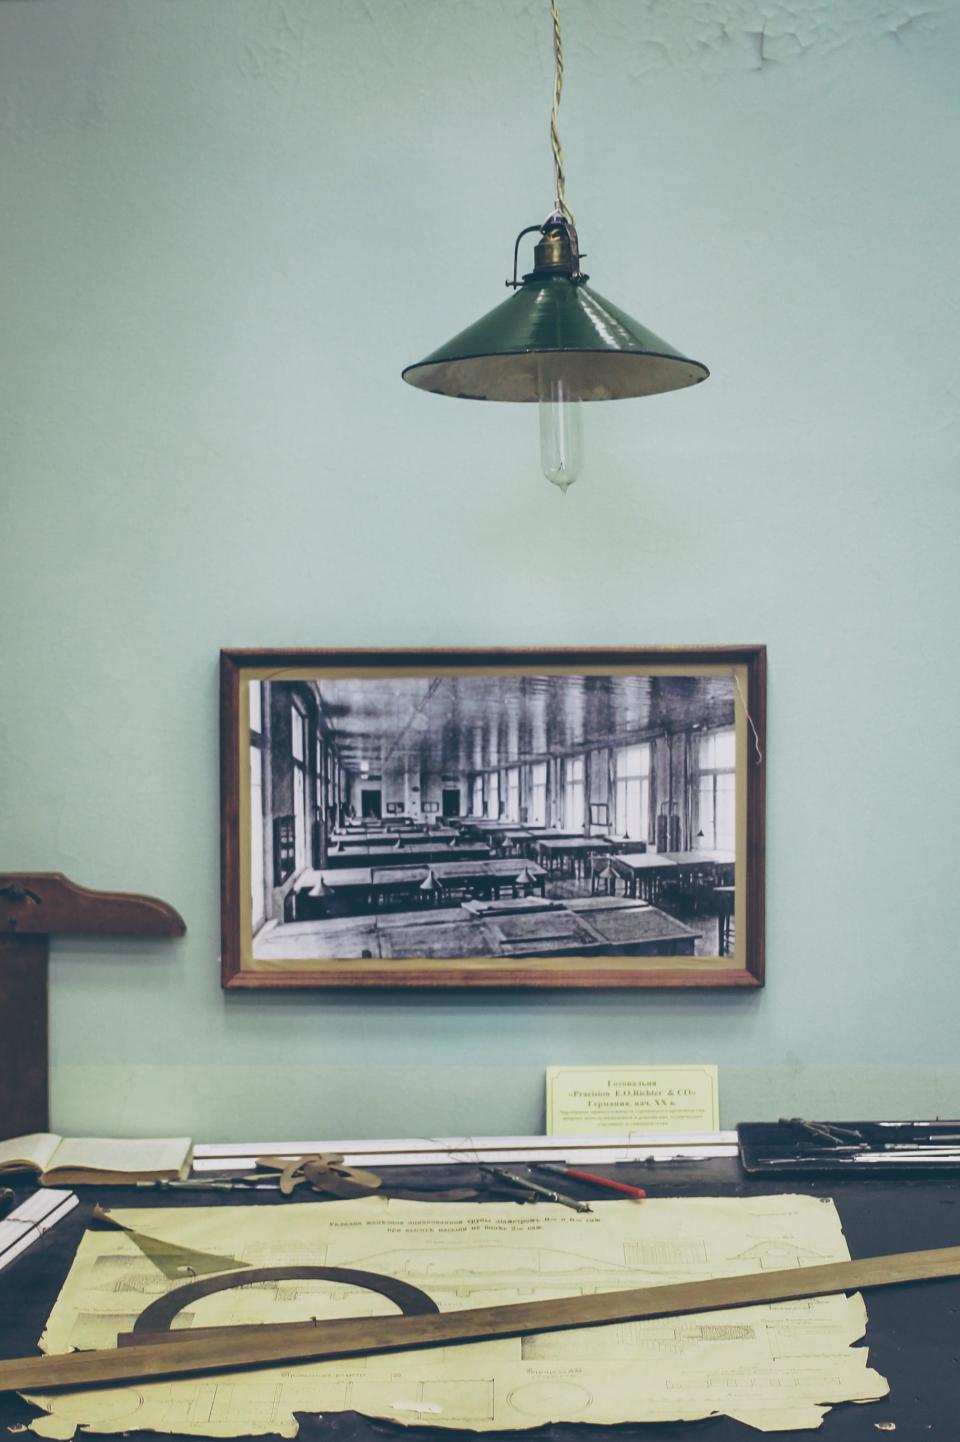 vintage desk ruler tools oldschool office painting frame objects